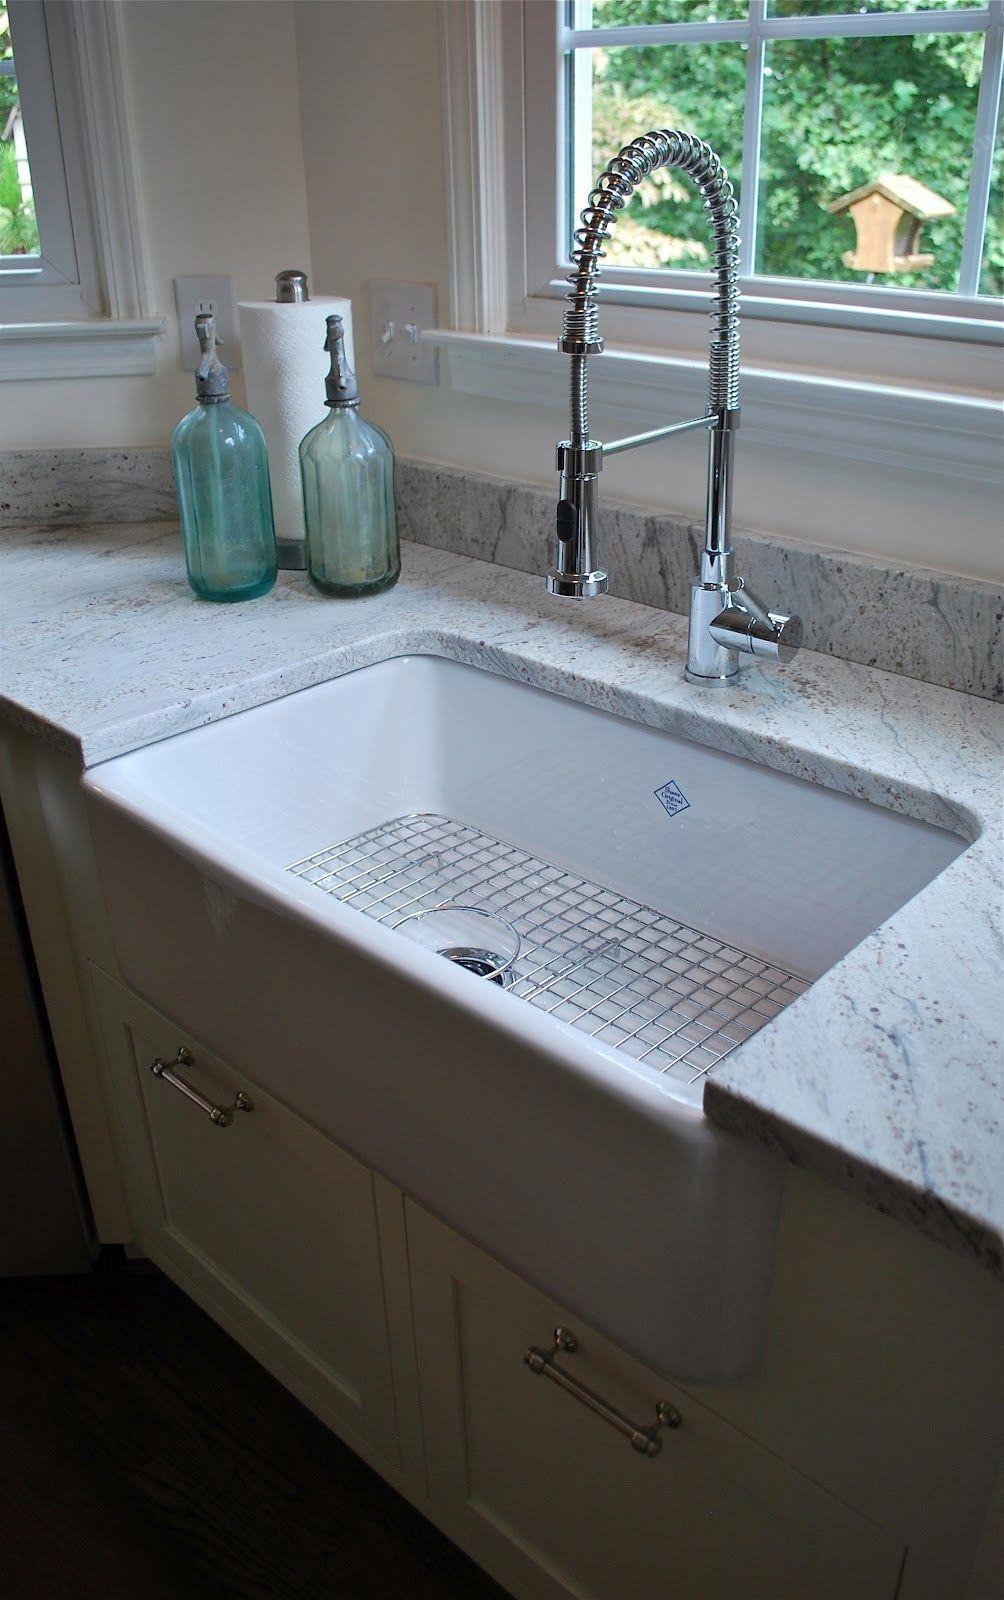 I really love this dazzling vintage sink vintagesink